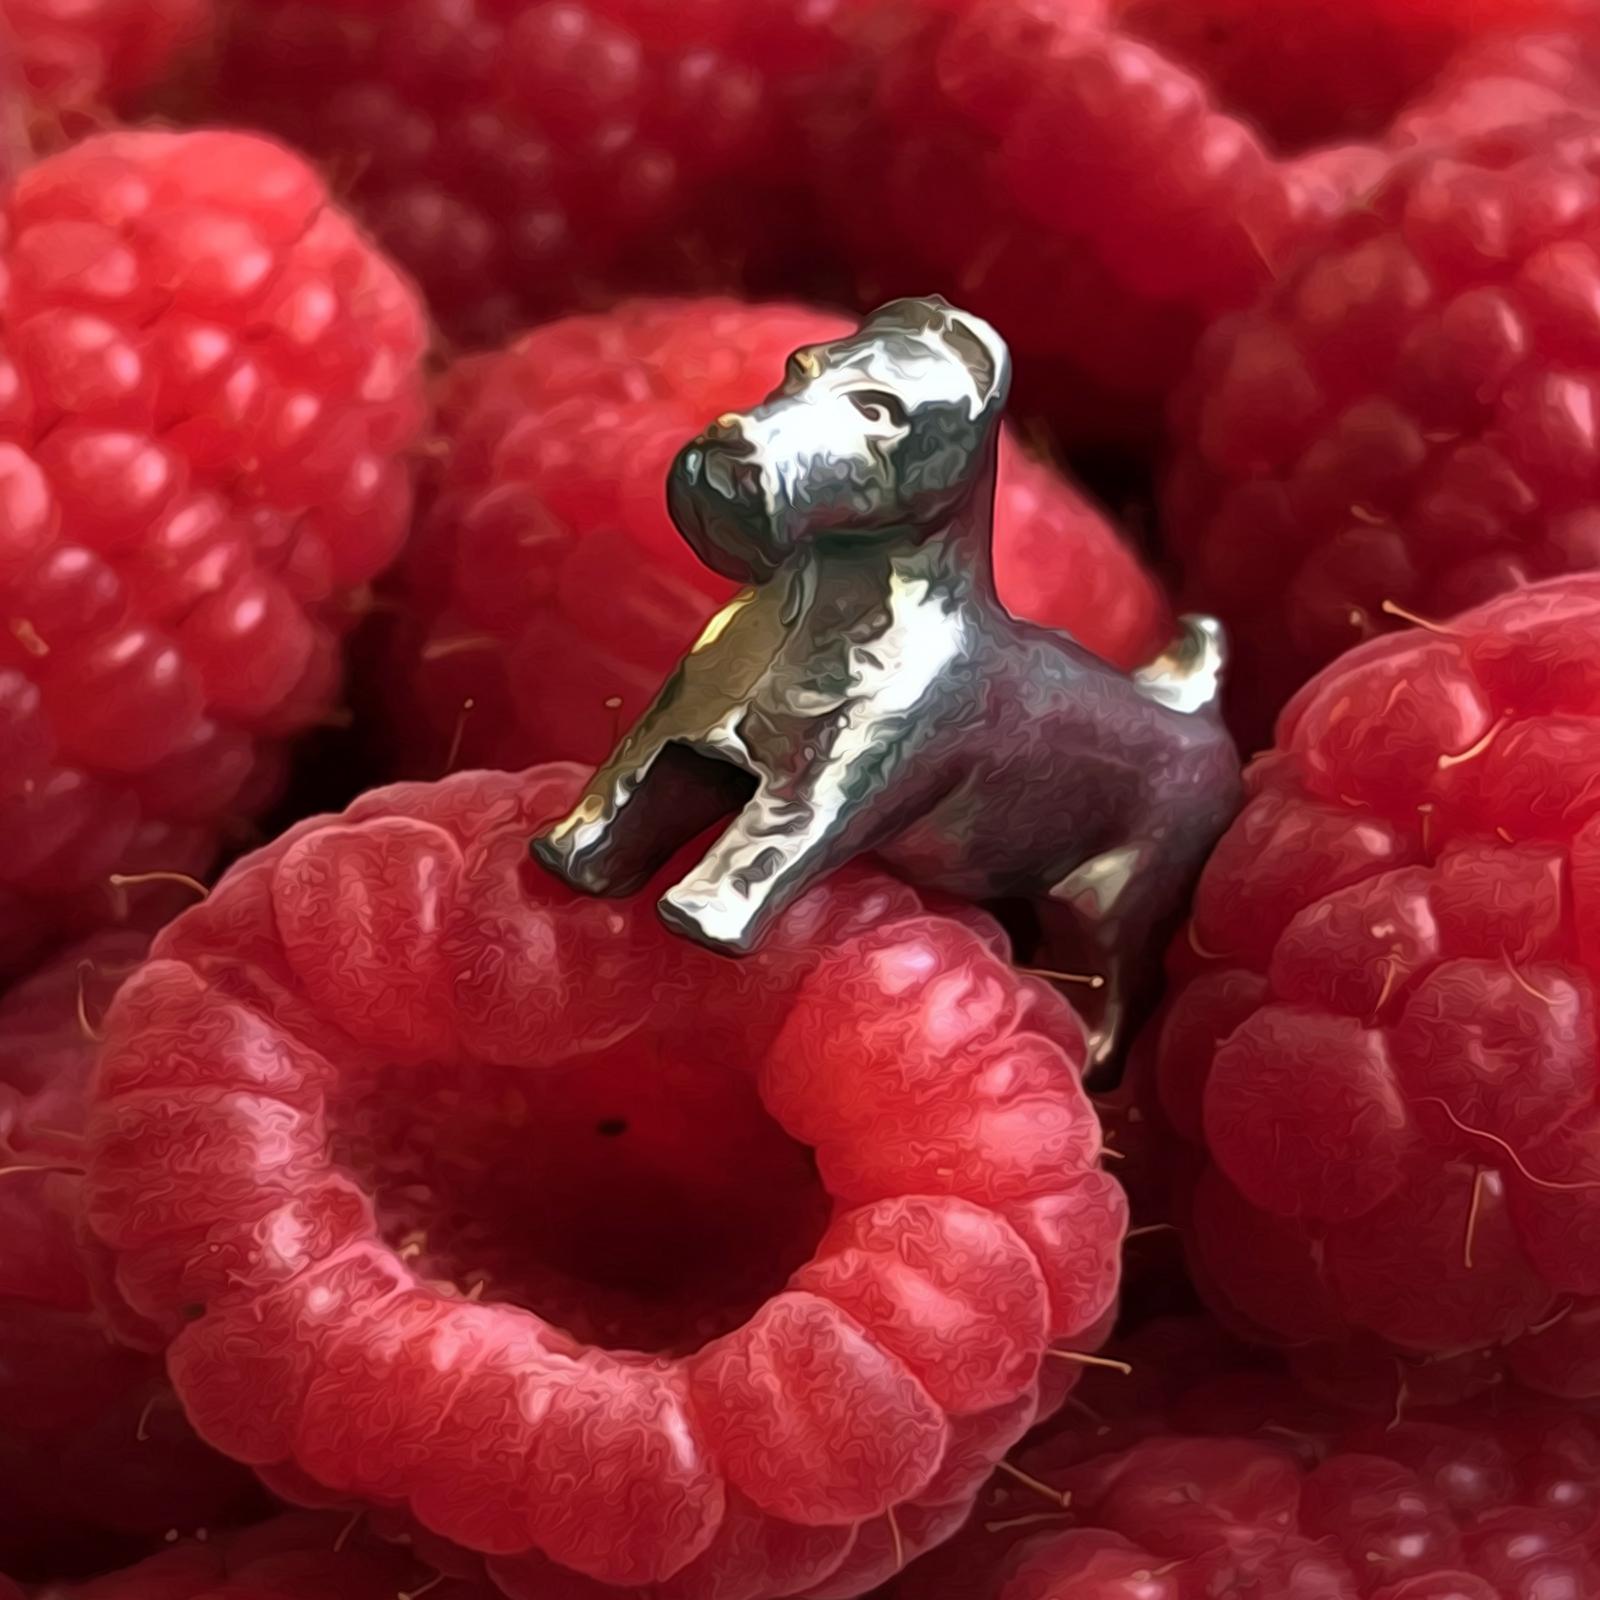 Exploring Planet Rubus